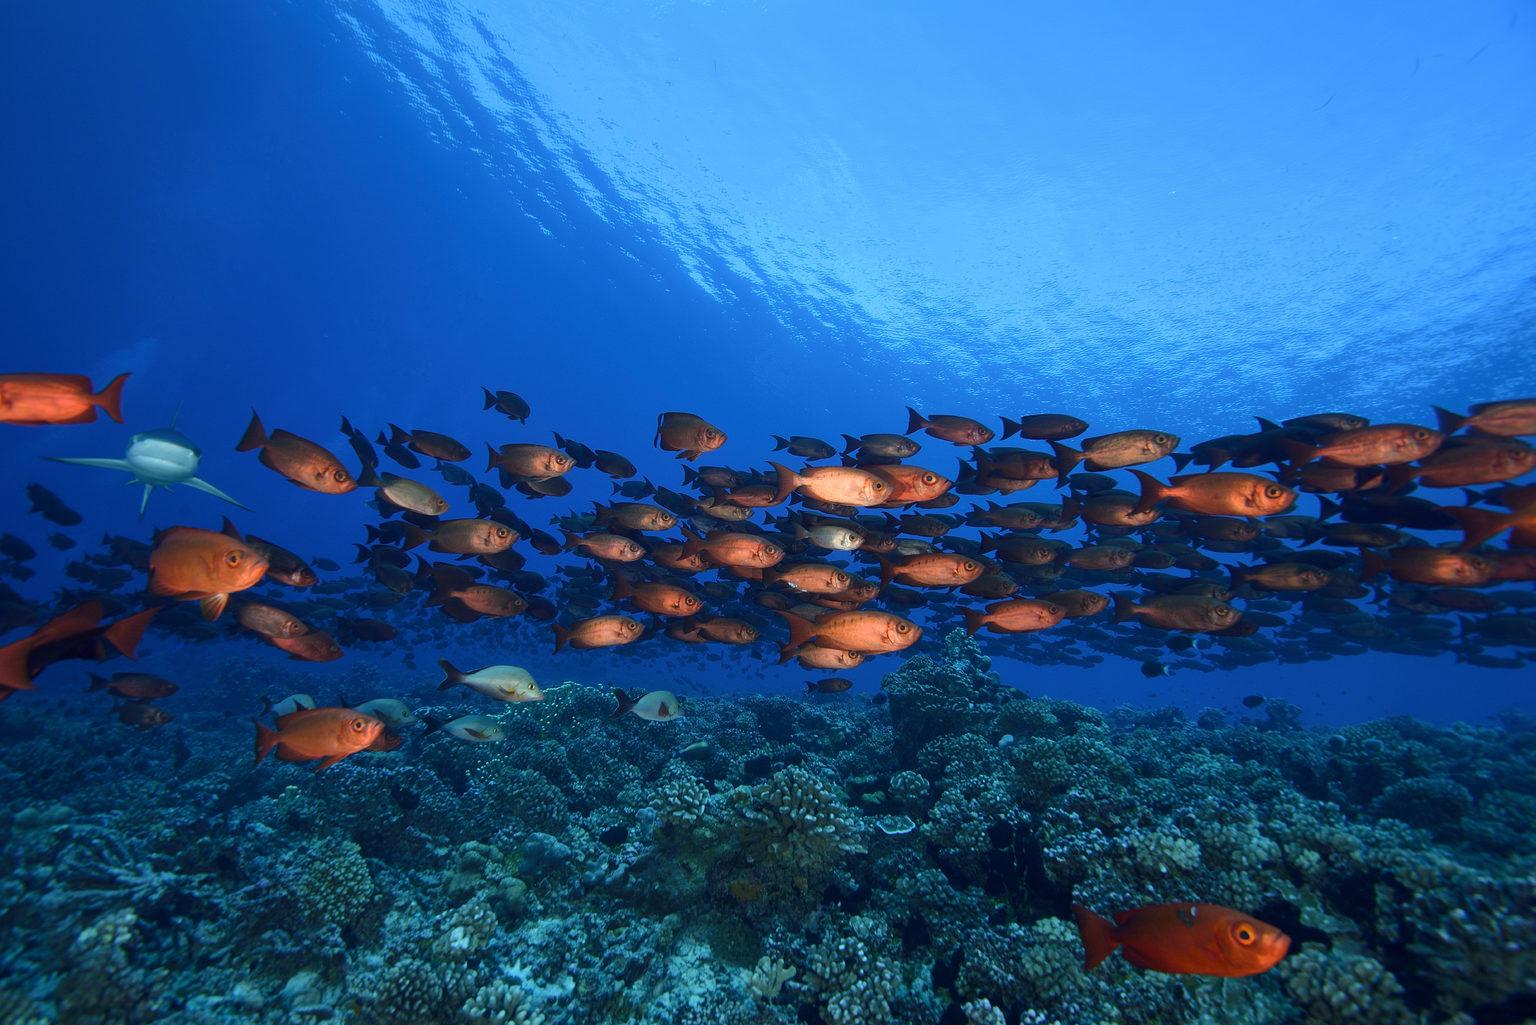 Priacanthus hamrur halfaj korallzátonynál. (Fotó: AFP)